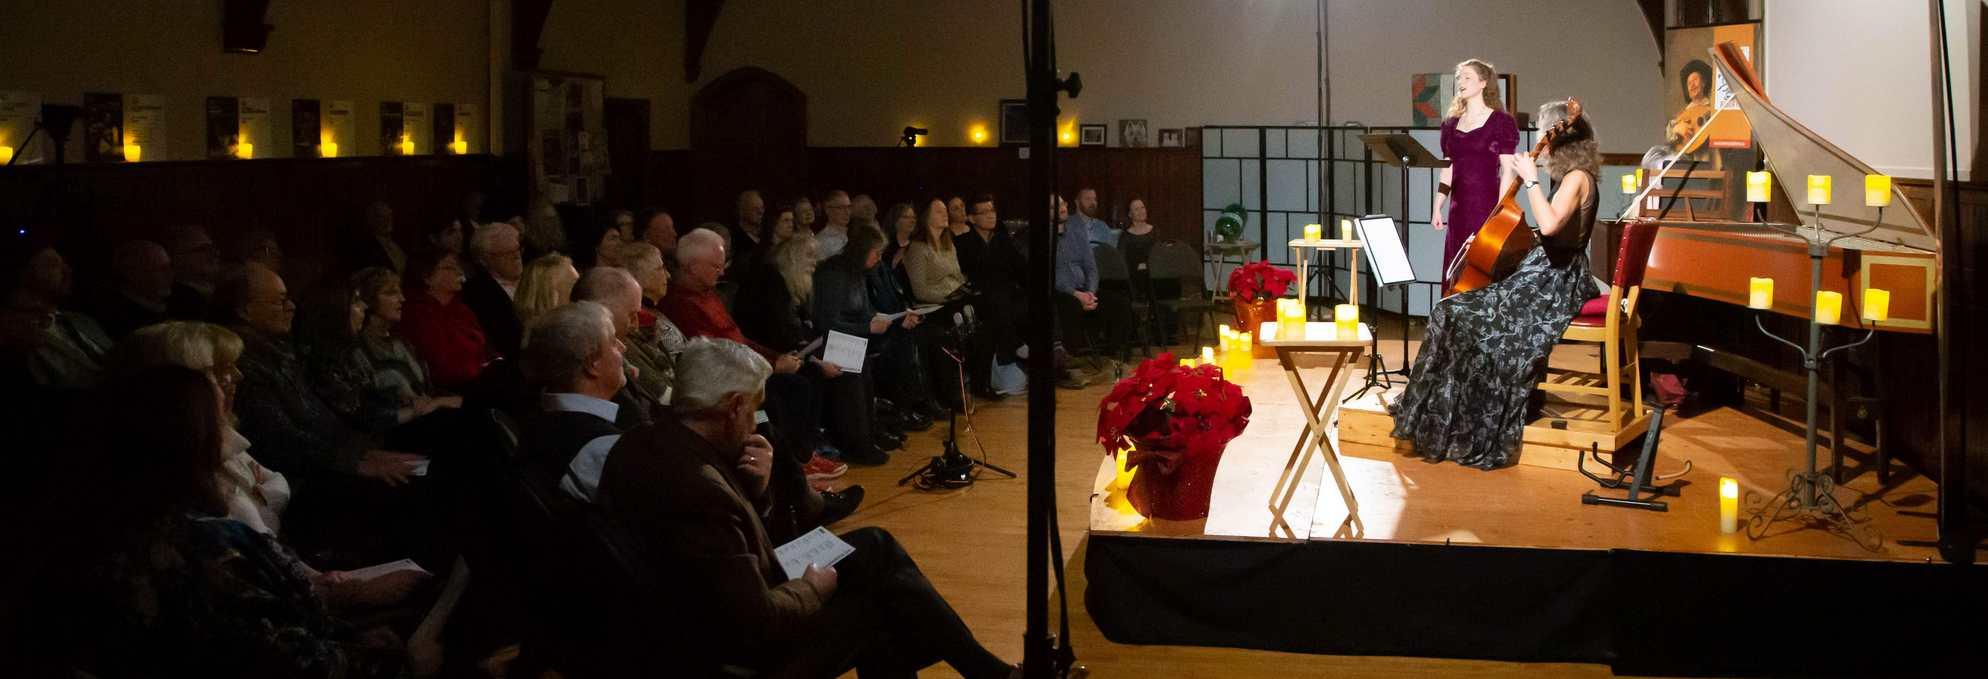 Early Music Alberta Concert with Dawn Bailey, Josephine van Lier and Marnie Giesbrecht